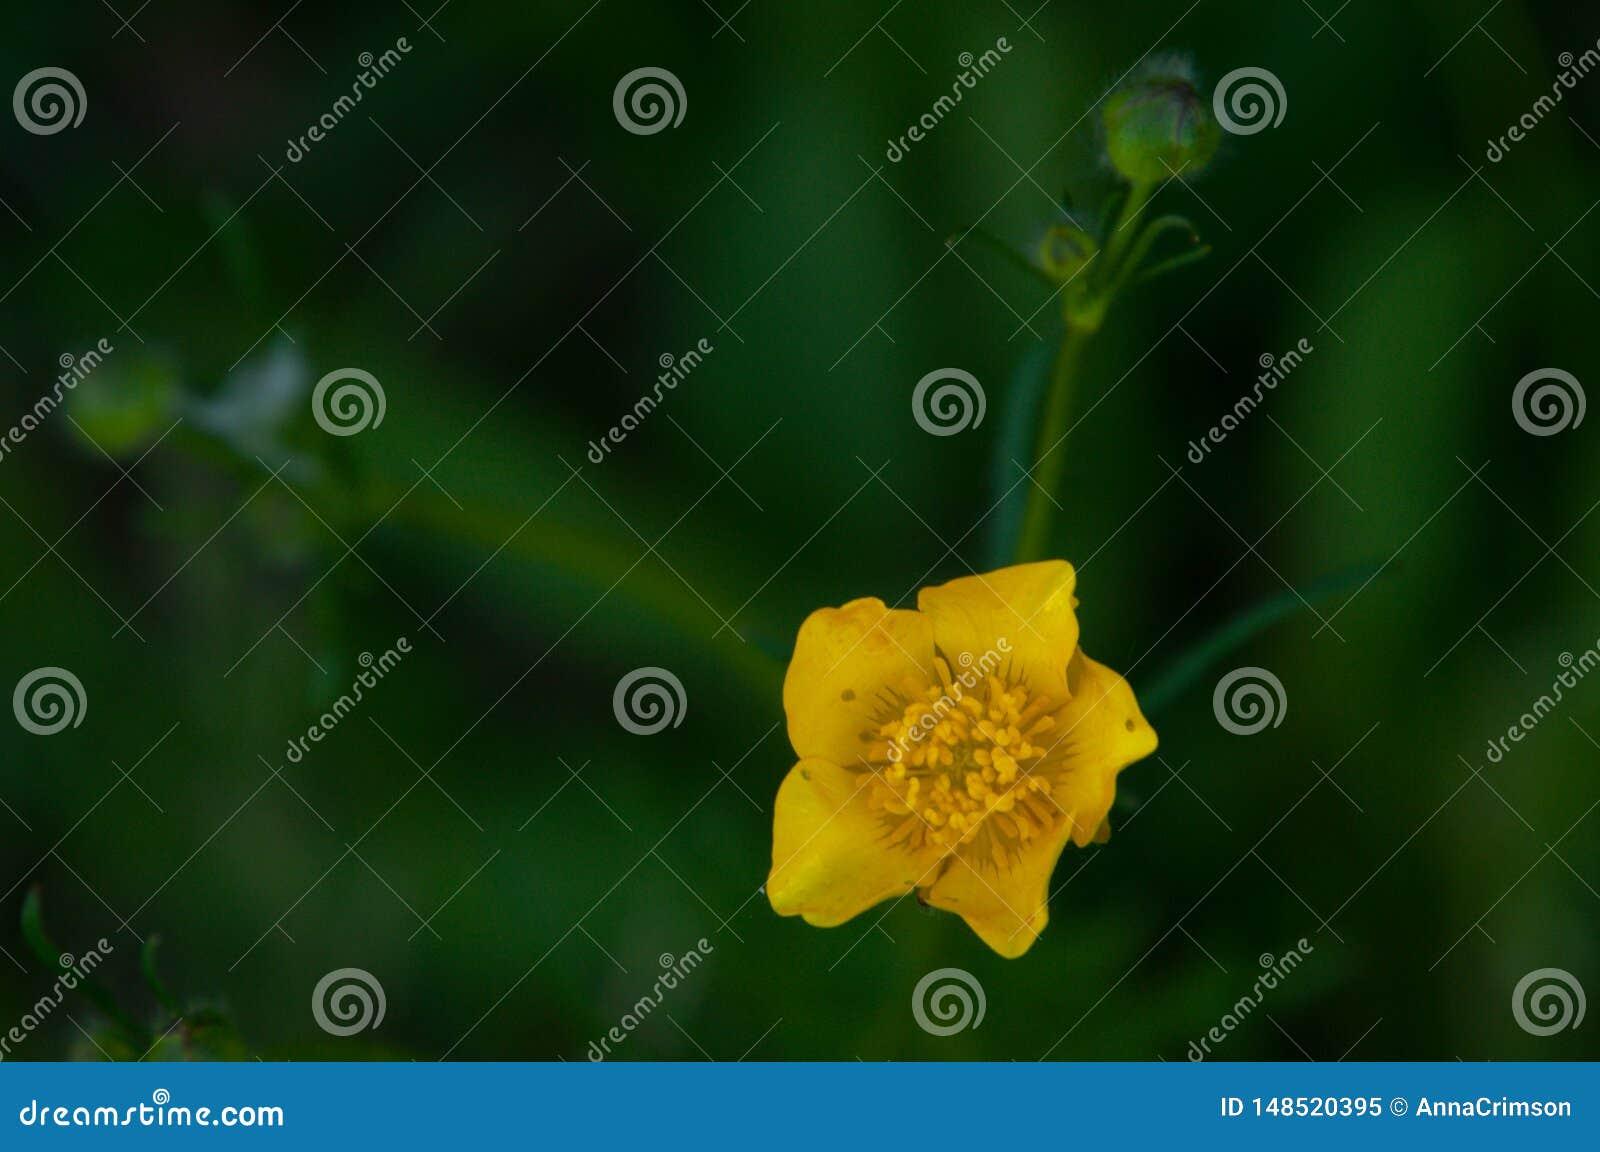 Marsh-marigold close-up